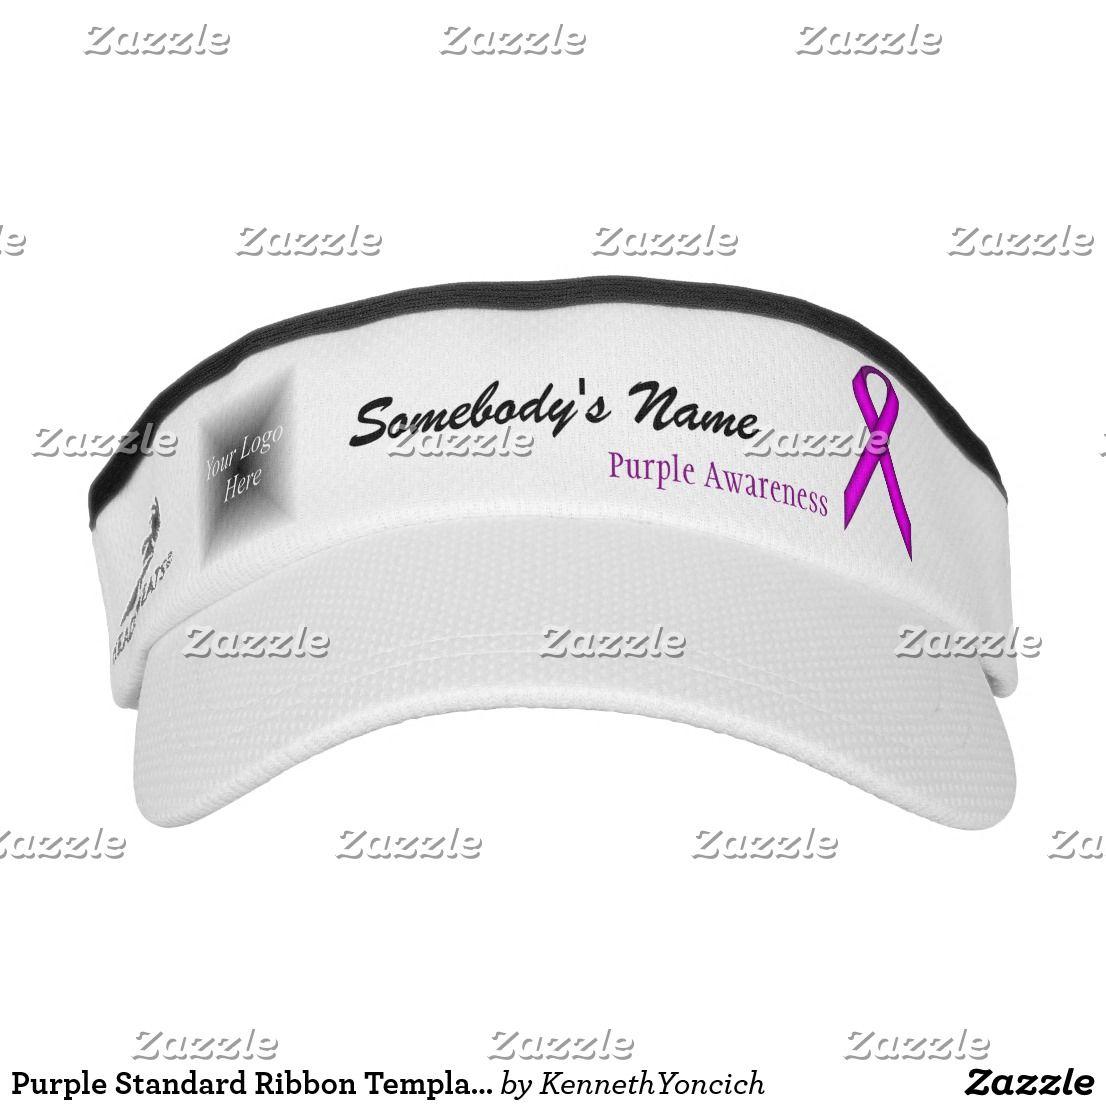 Purple Standard Ribbon Template Visor | Stuff SOLD on Zazzle ...